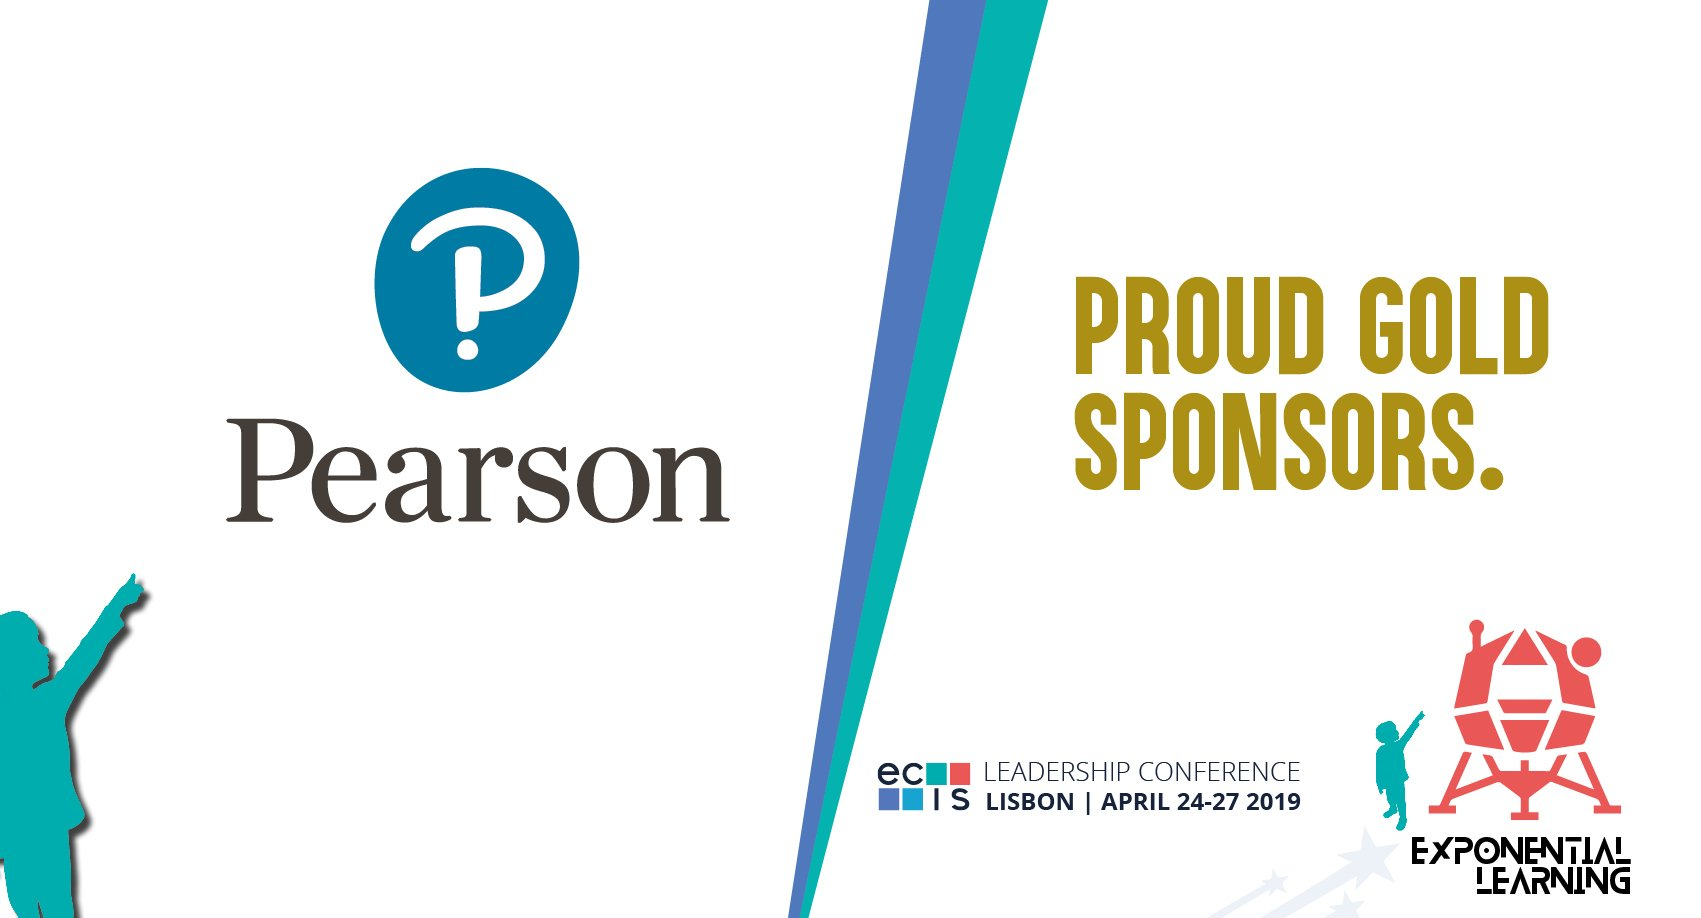 Pearson sponsor logo